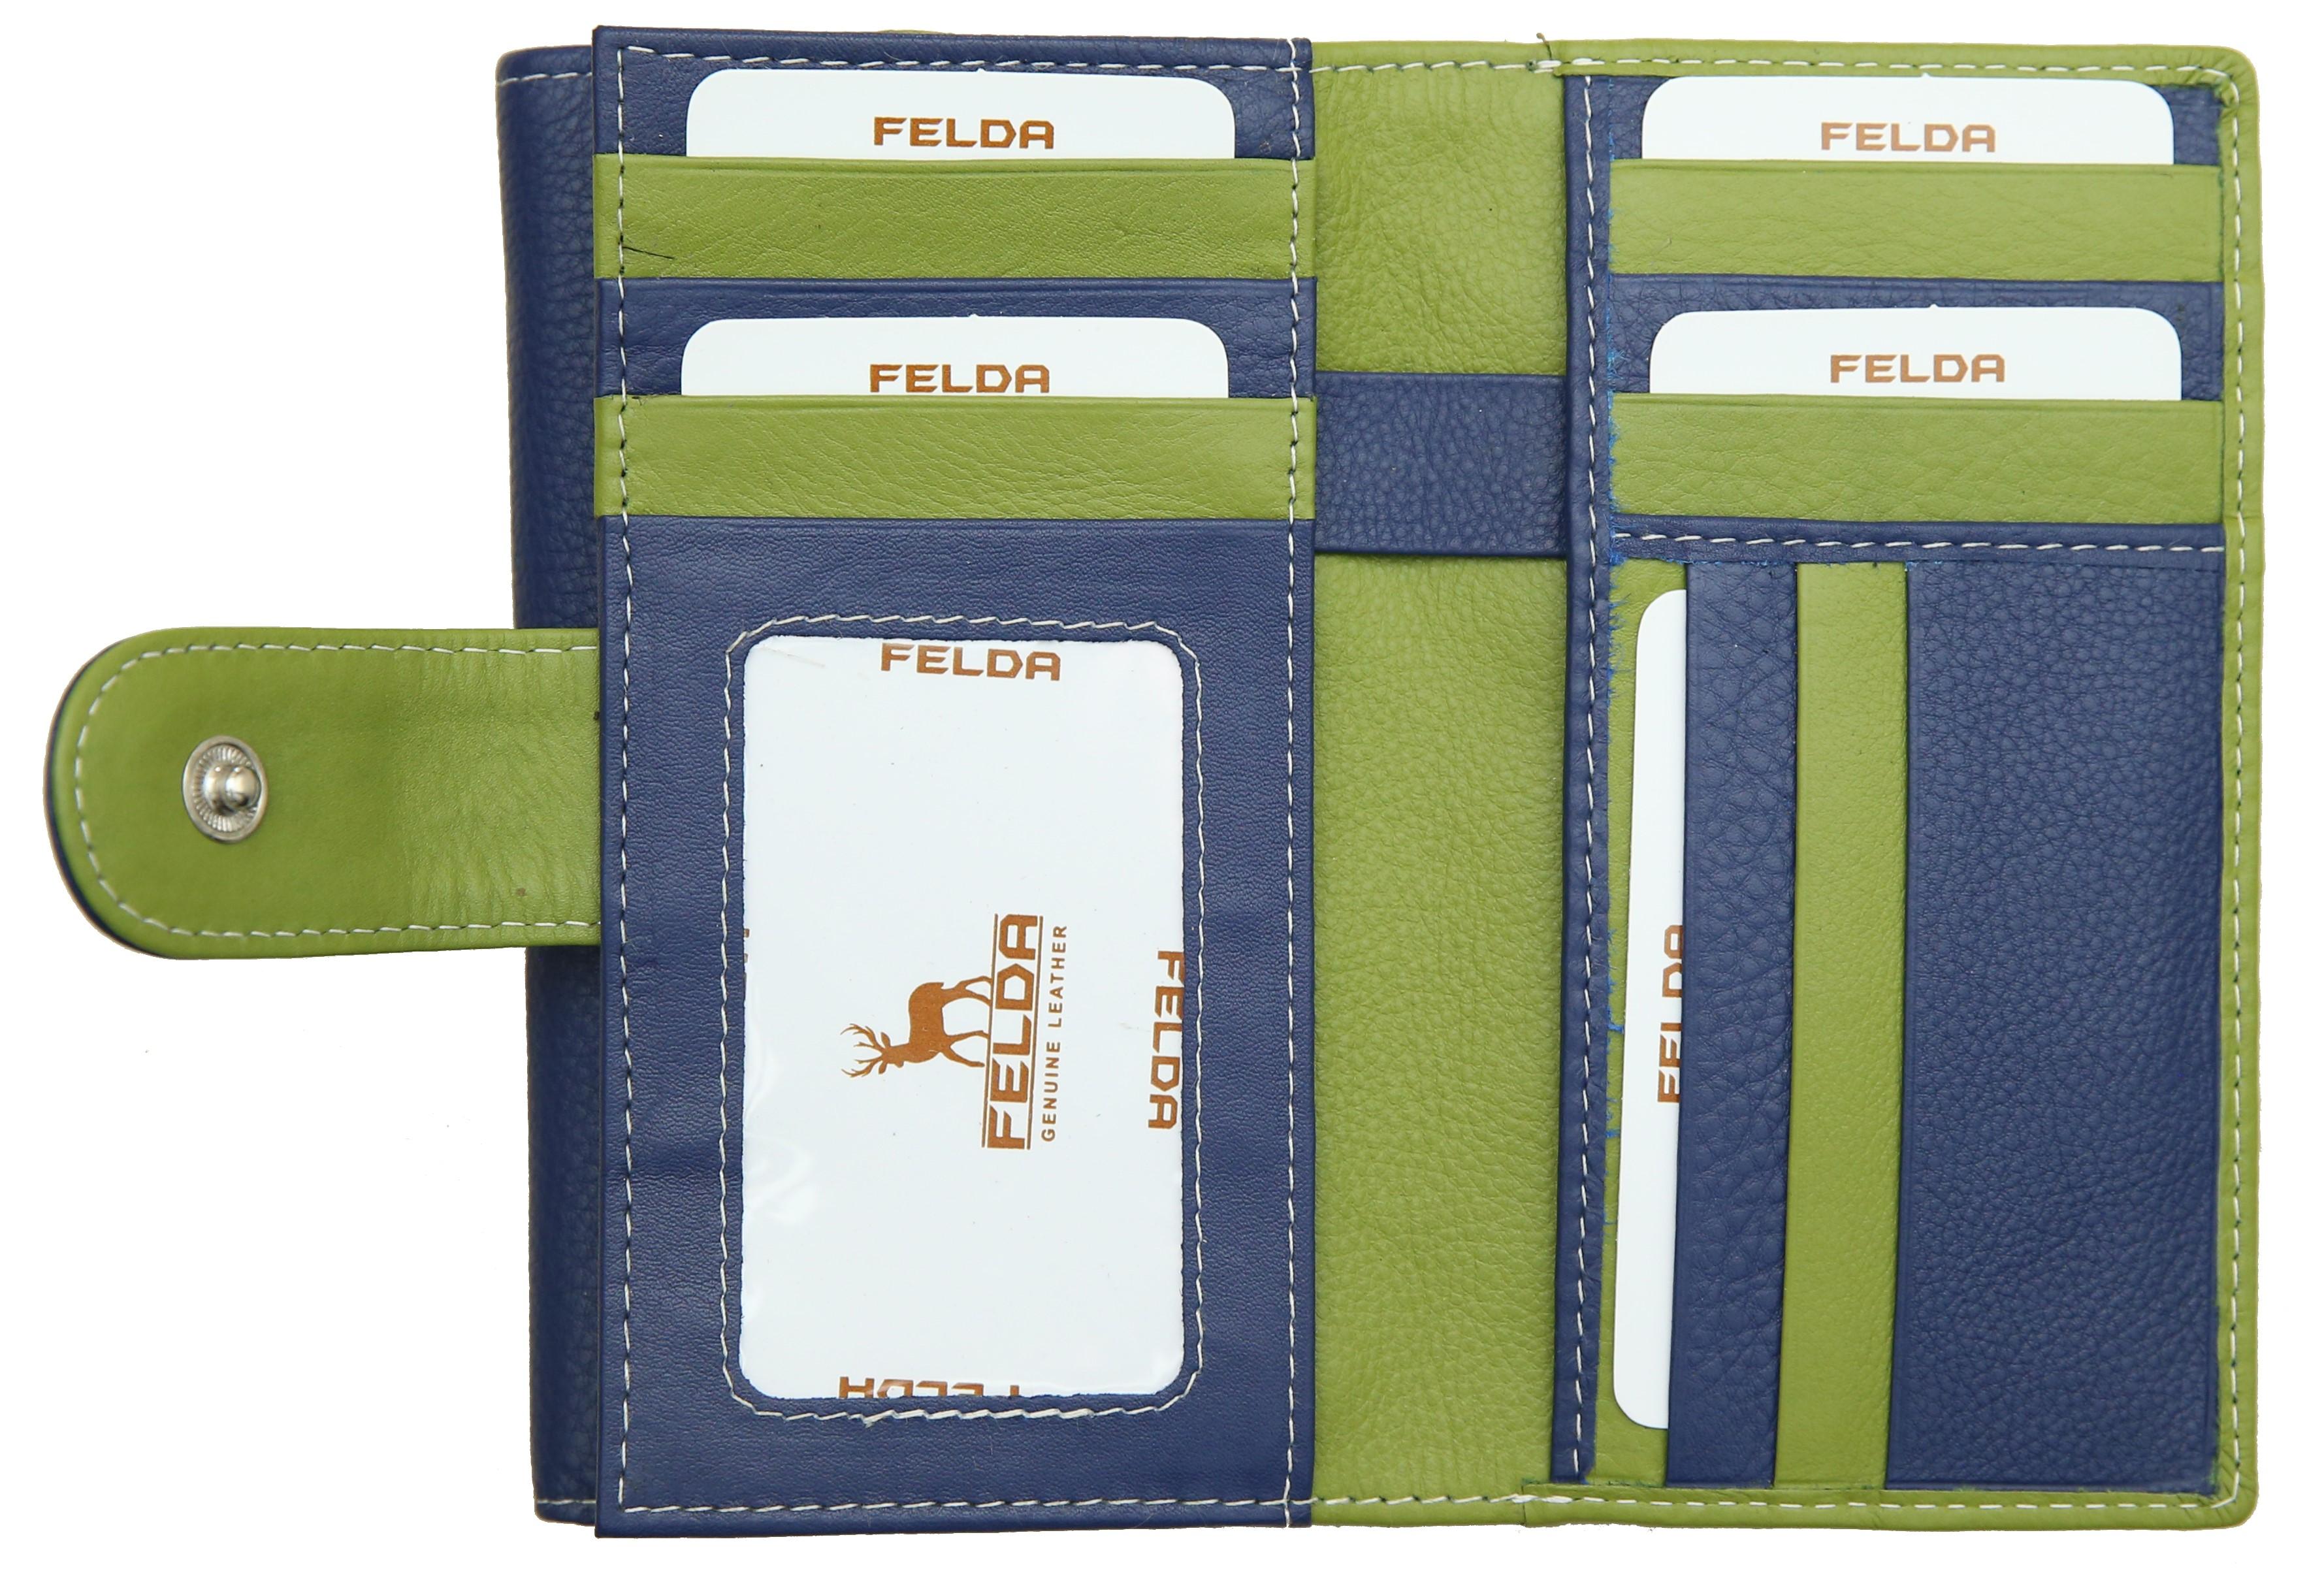 Felda-Portefeuille-pour-cartes-de-credit-cuir-souple-plusieurs-coloris miniature 10